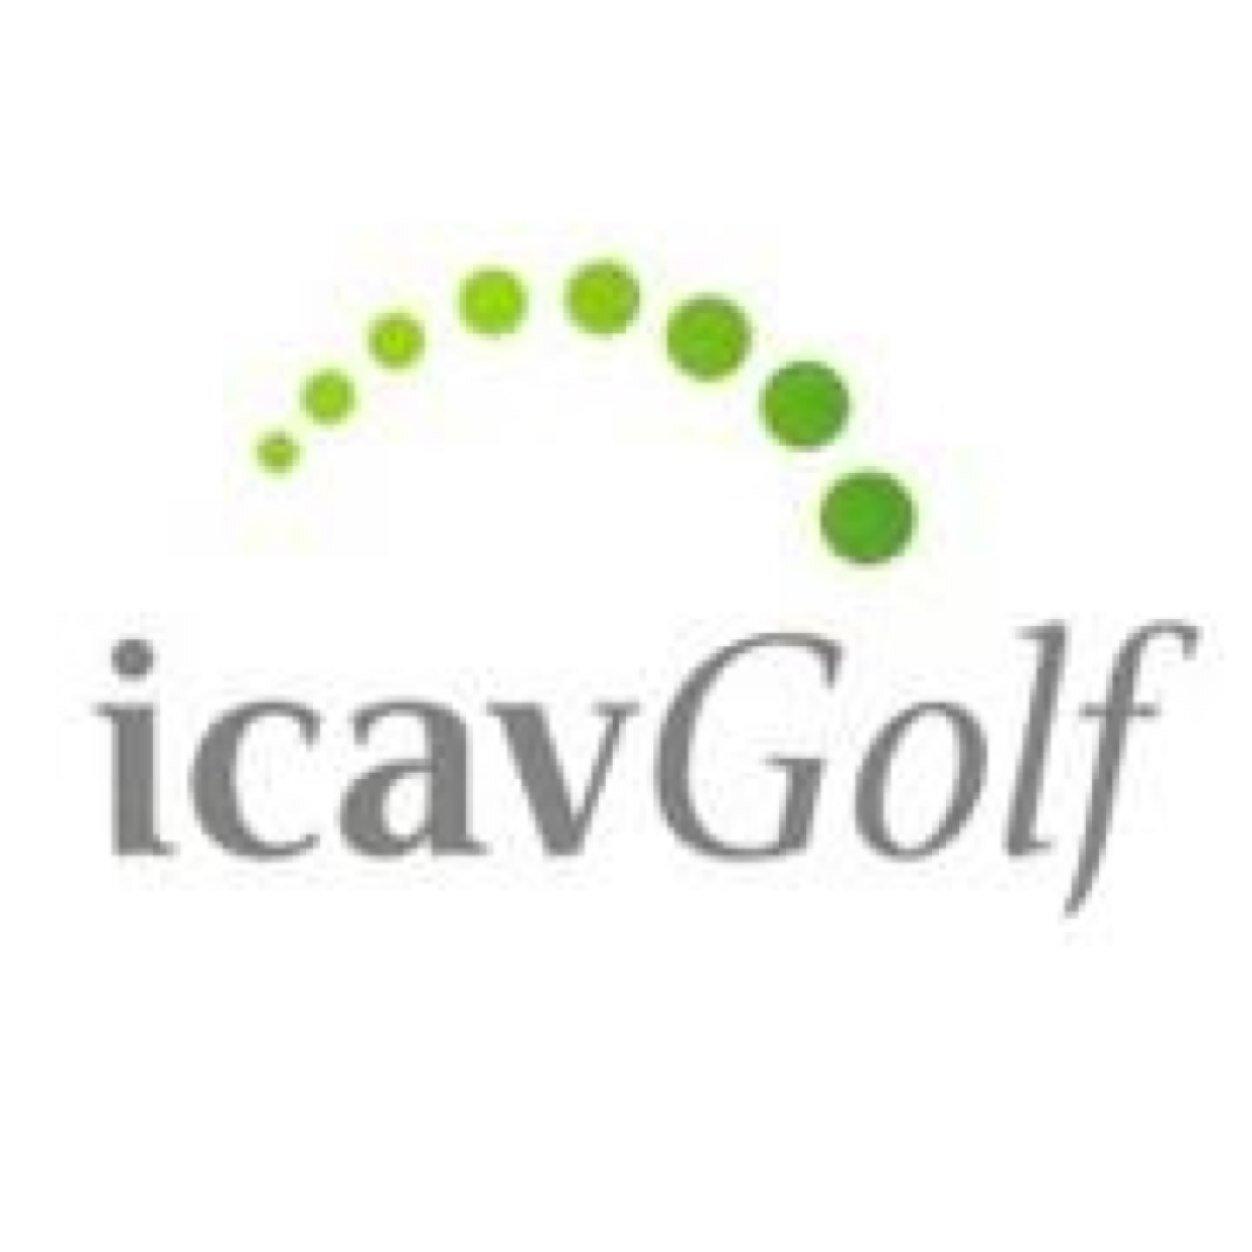 Circuito Yoingolf : Icavgolf @icavgolf twitter